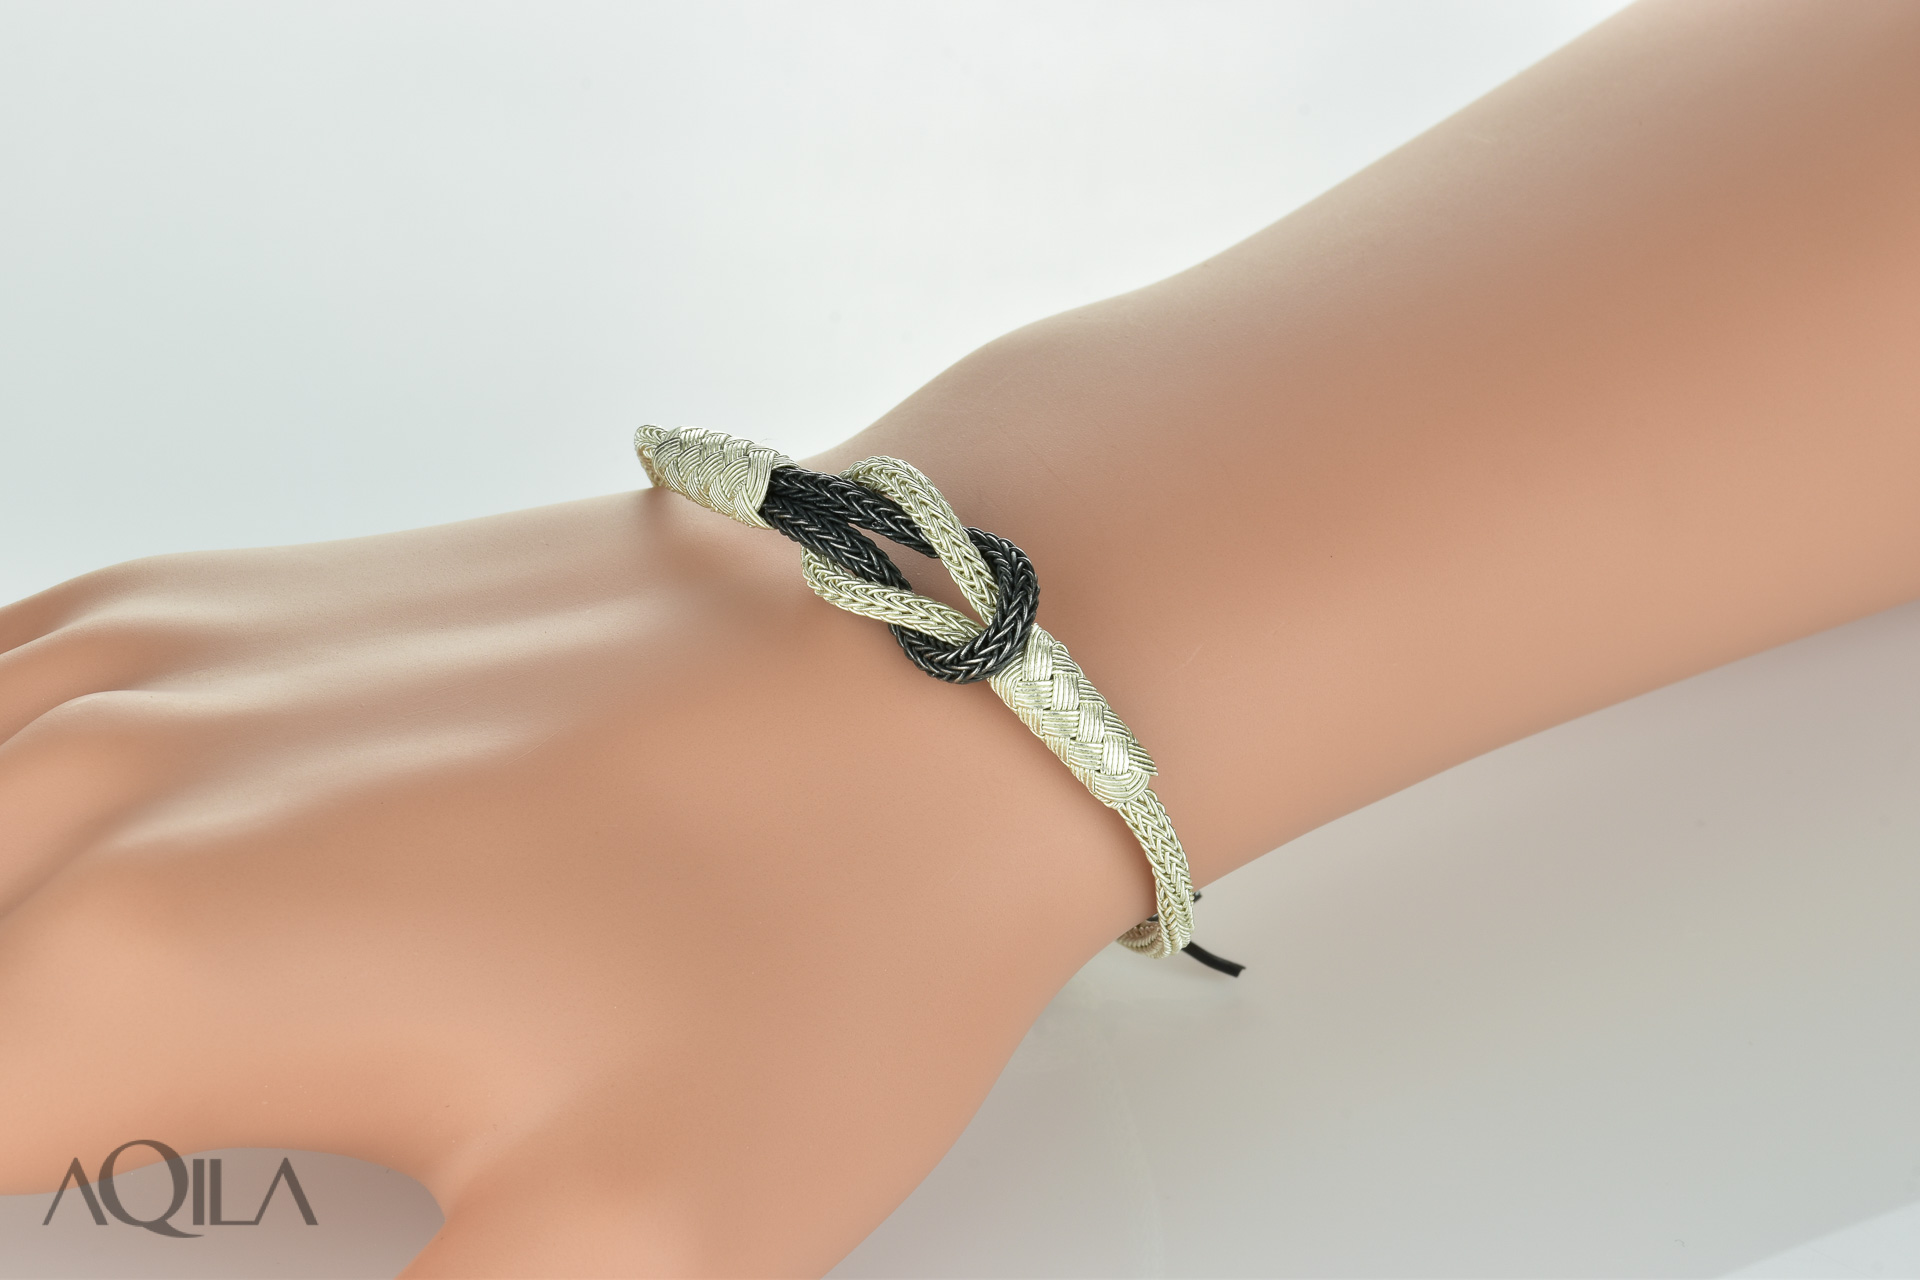 999 Silber Kordel Armband mit Herkulesknoten, Liebesknoten, zweifarbig,  10534 7a3b07d963